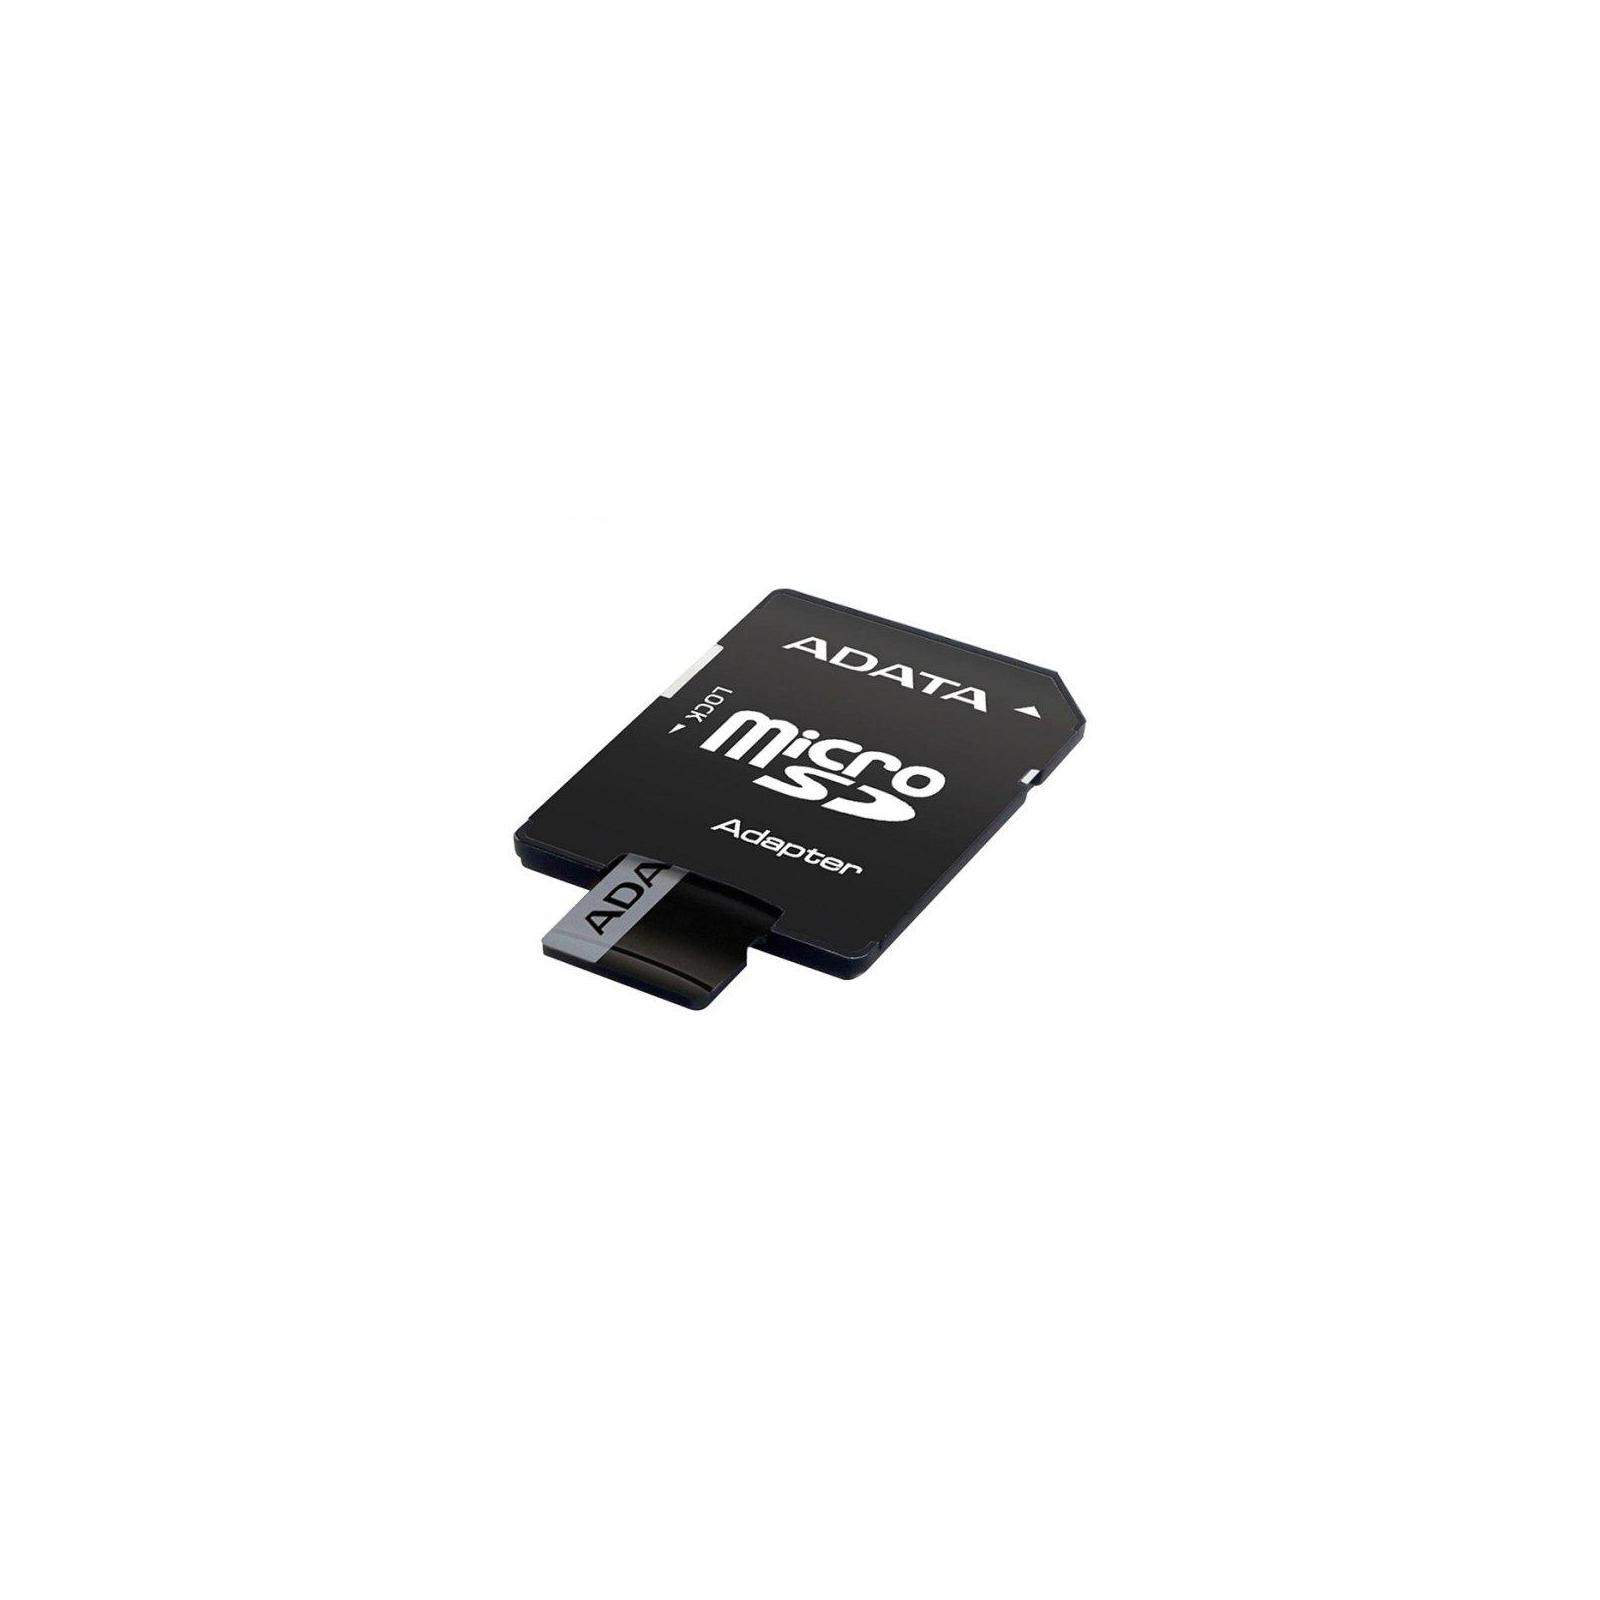 Карта памяти ADATA 32GB microSD class 10 UHS-I U3 A1 (AUSDH32GUI3V30SA1-RA1) изображение 3